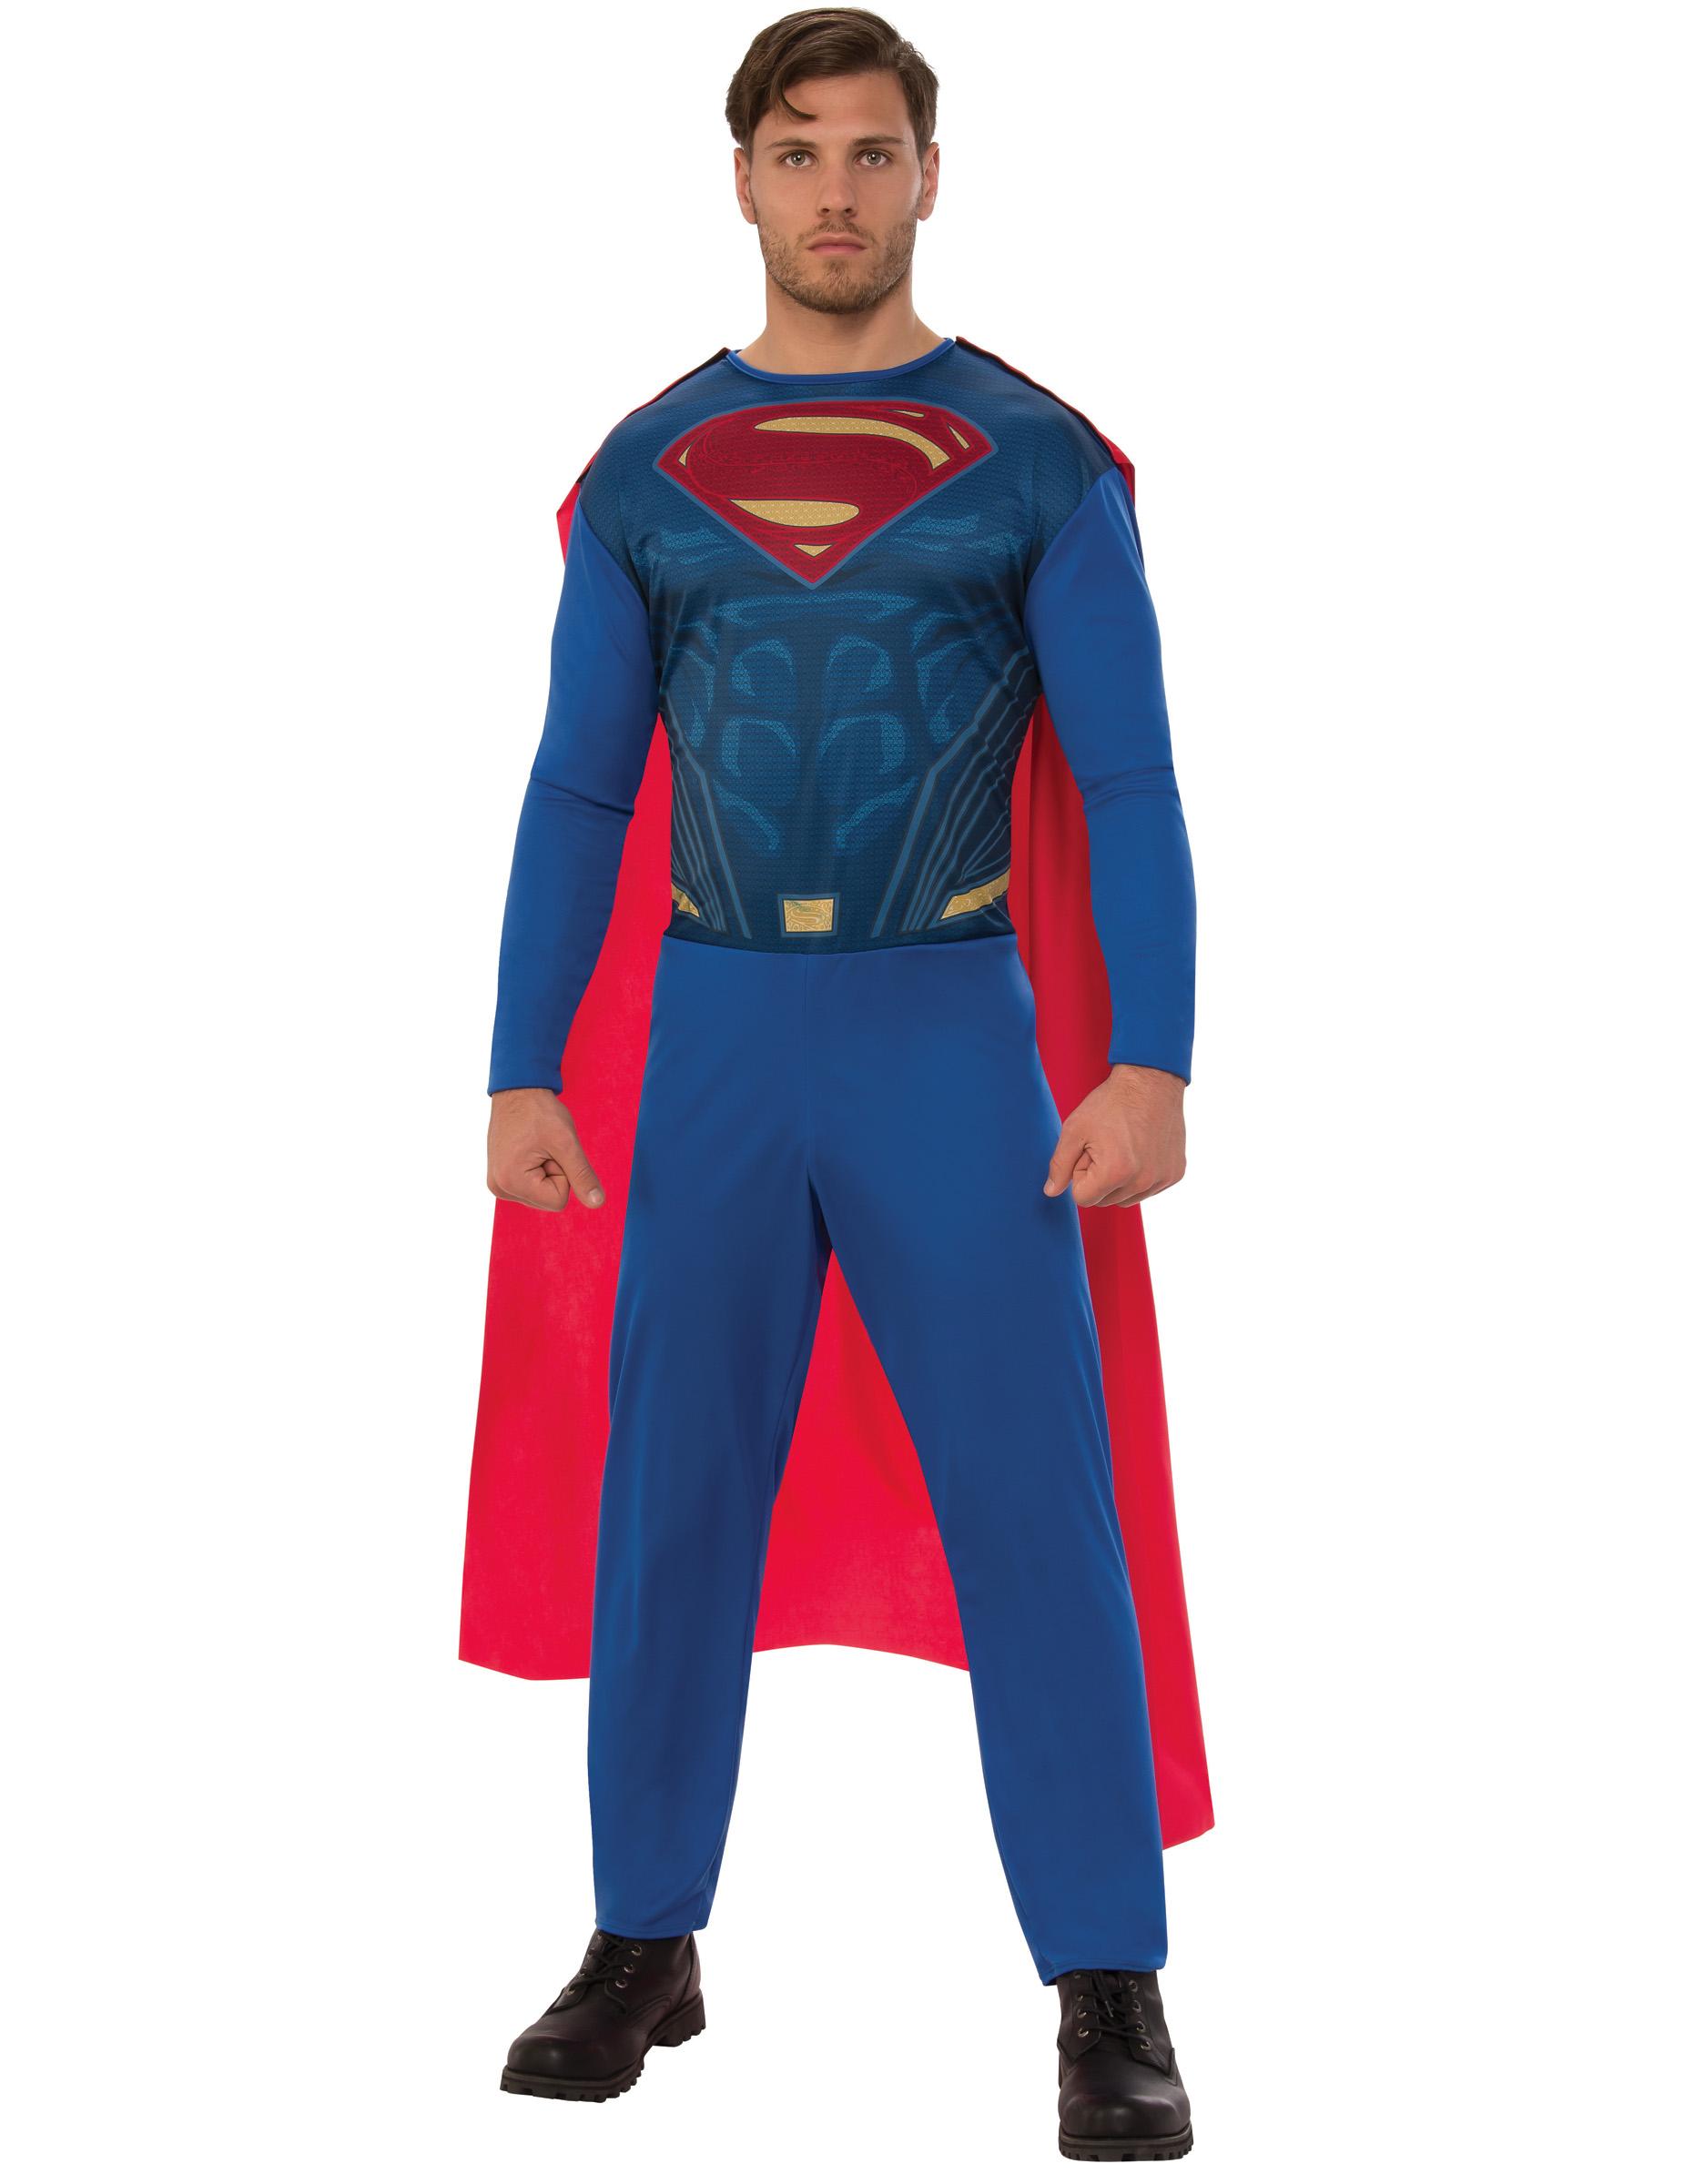 superman kost m f r erwachsene rot blau kost me f r. Black Bedroom Furniture Sets. Home Design Ideas